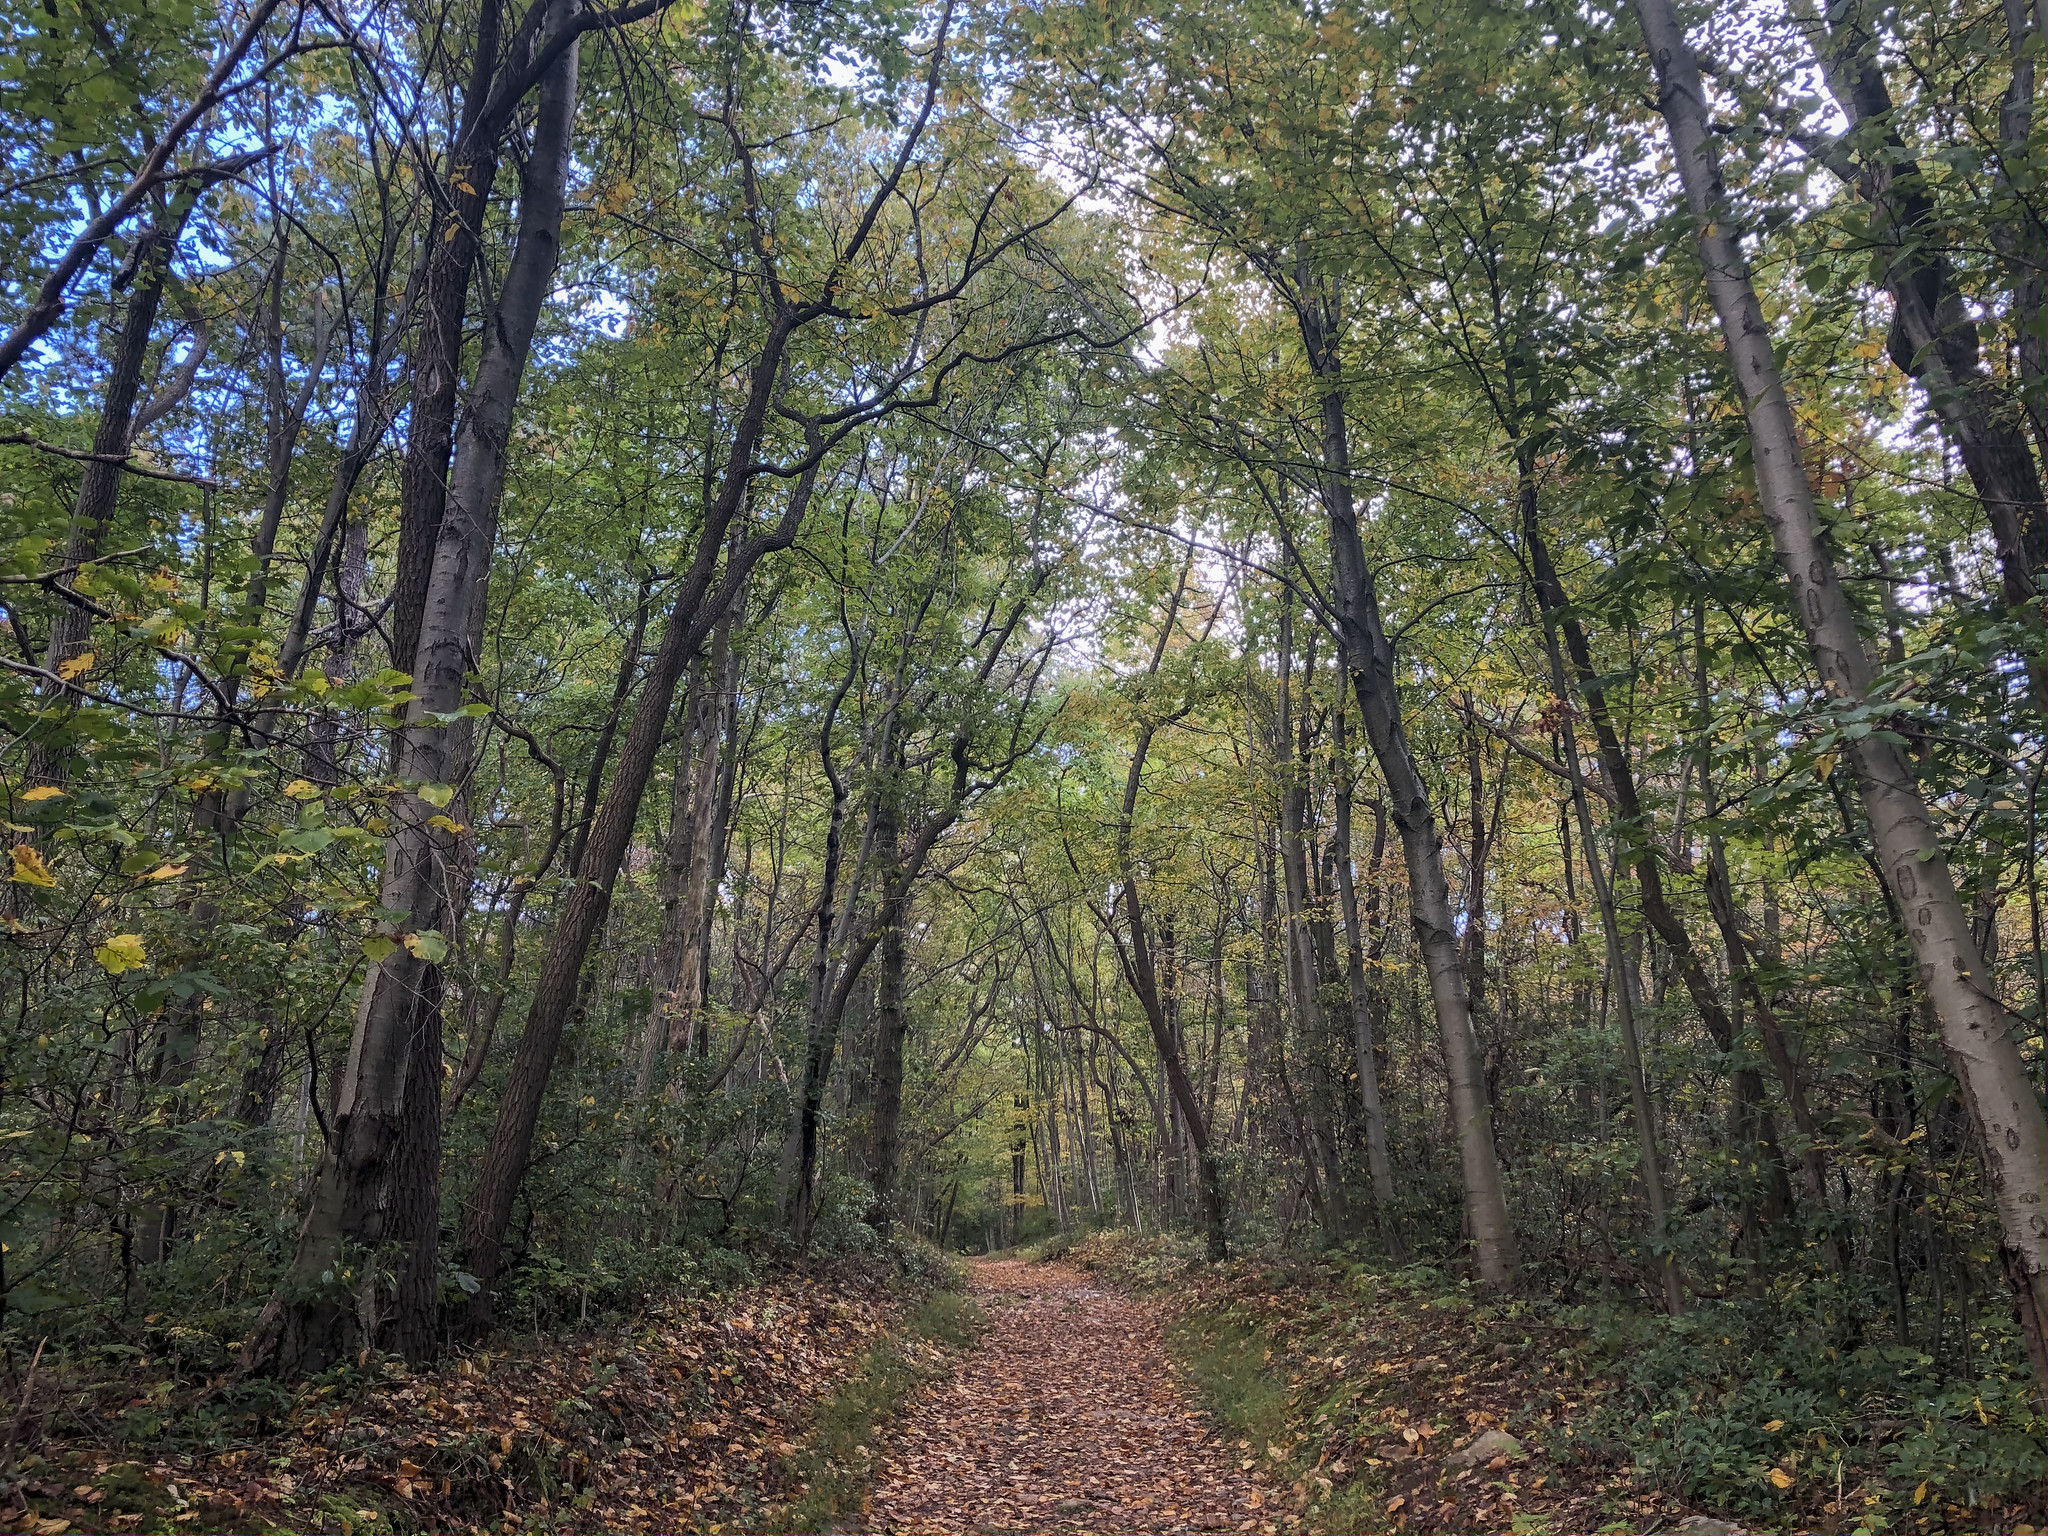 October 2 2020 Hike